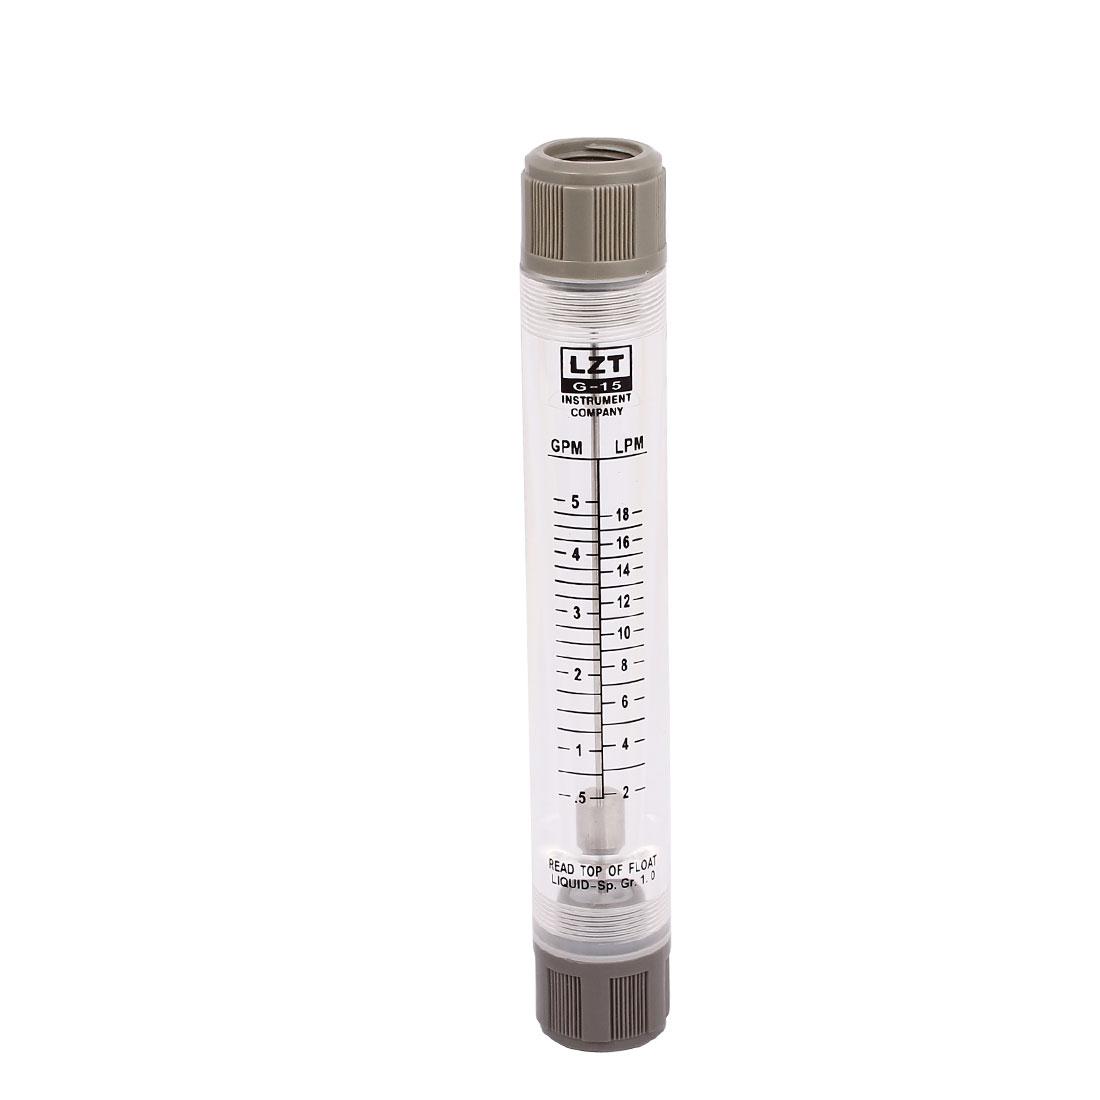 LZM-15G 0.5-5GPM Tube Type Flowmeter Flow Meter Rotameter for Gas Liquid